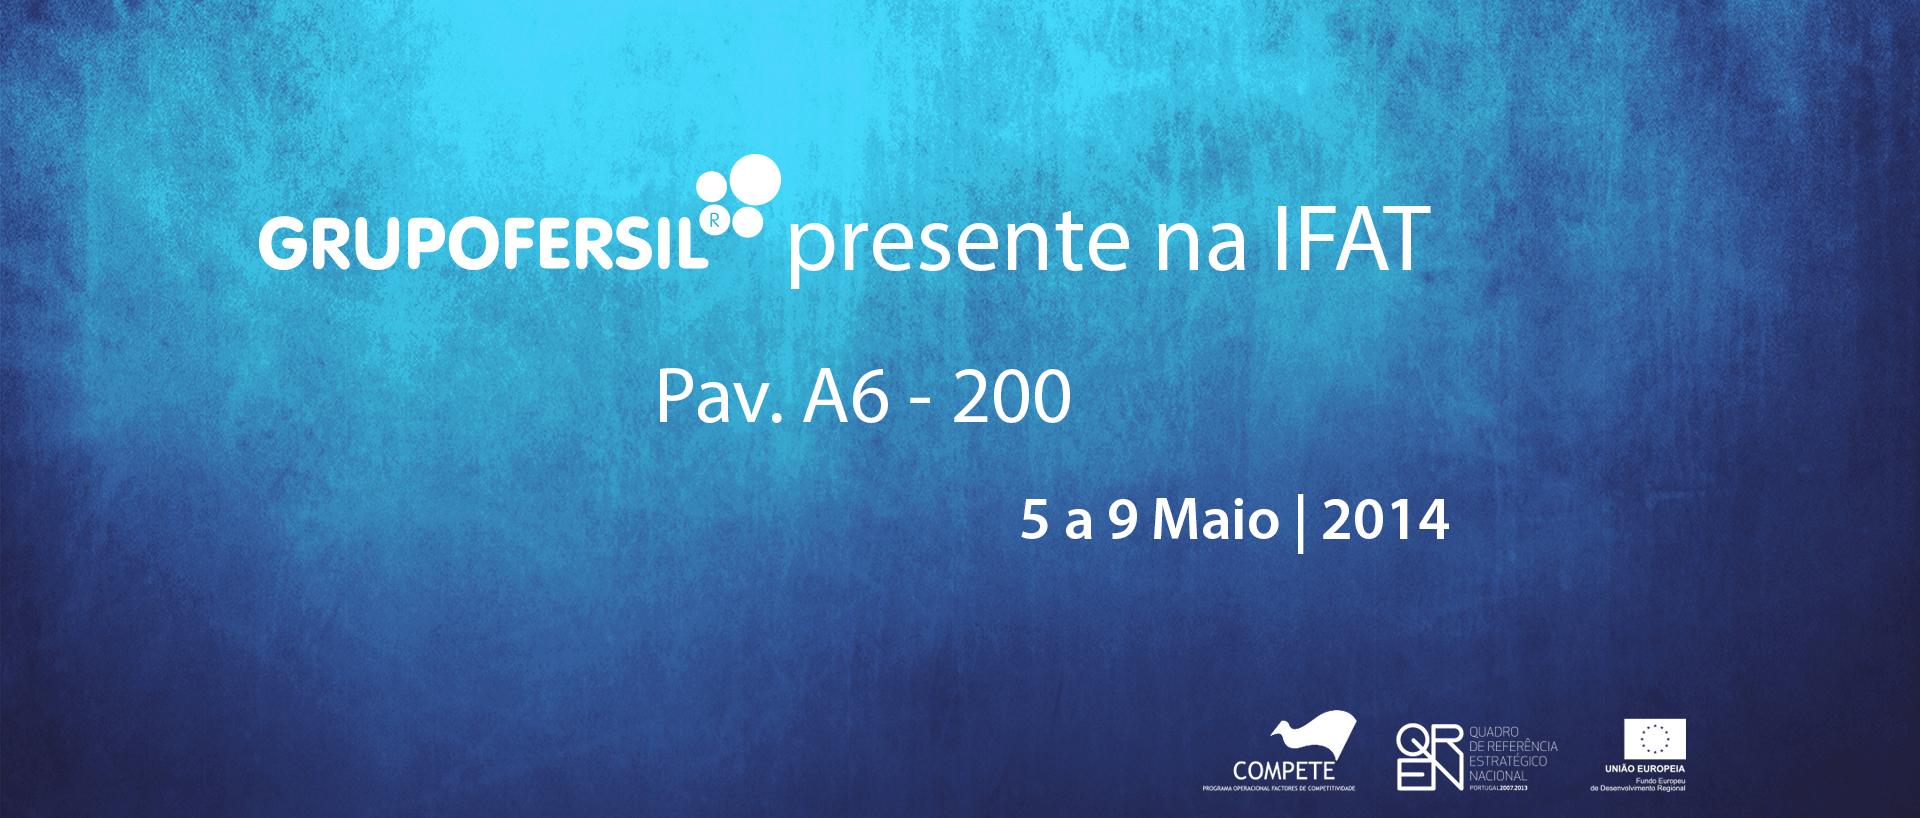 Grupo Fersil presente na iFat 2014, através da Ibotec Grupo Fersil